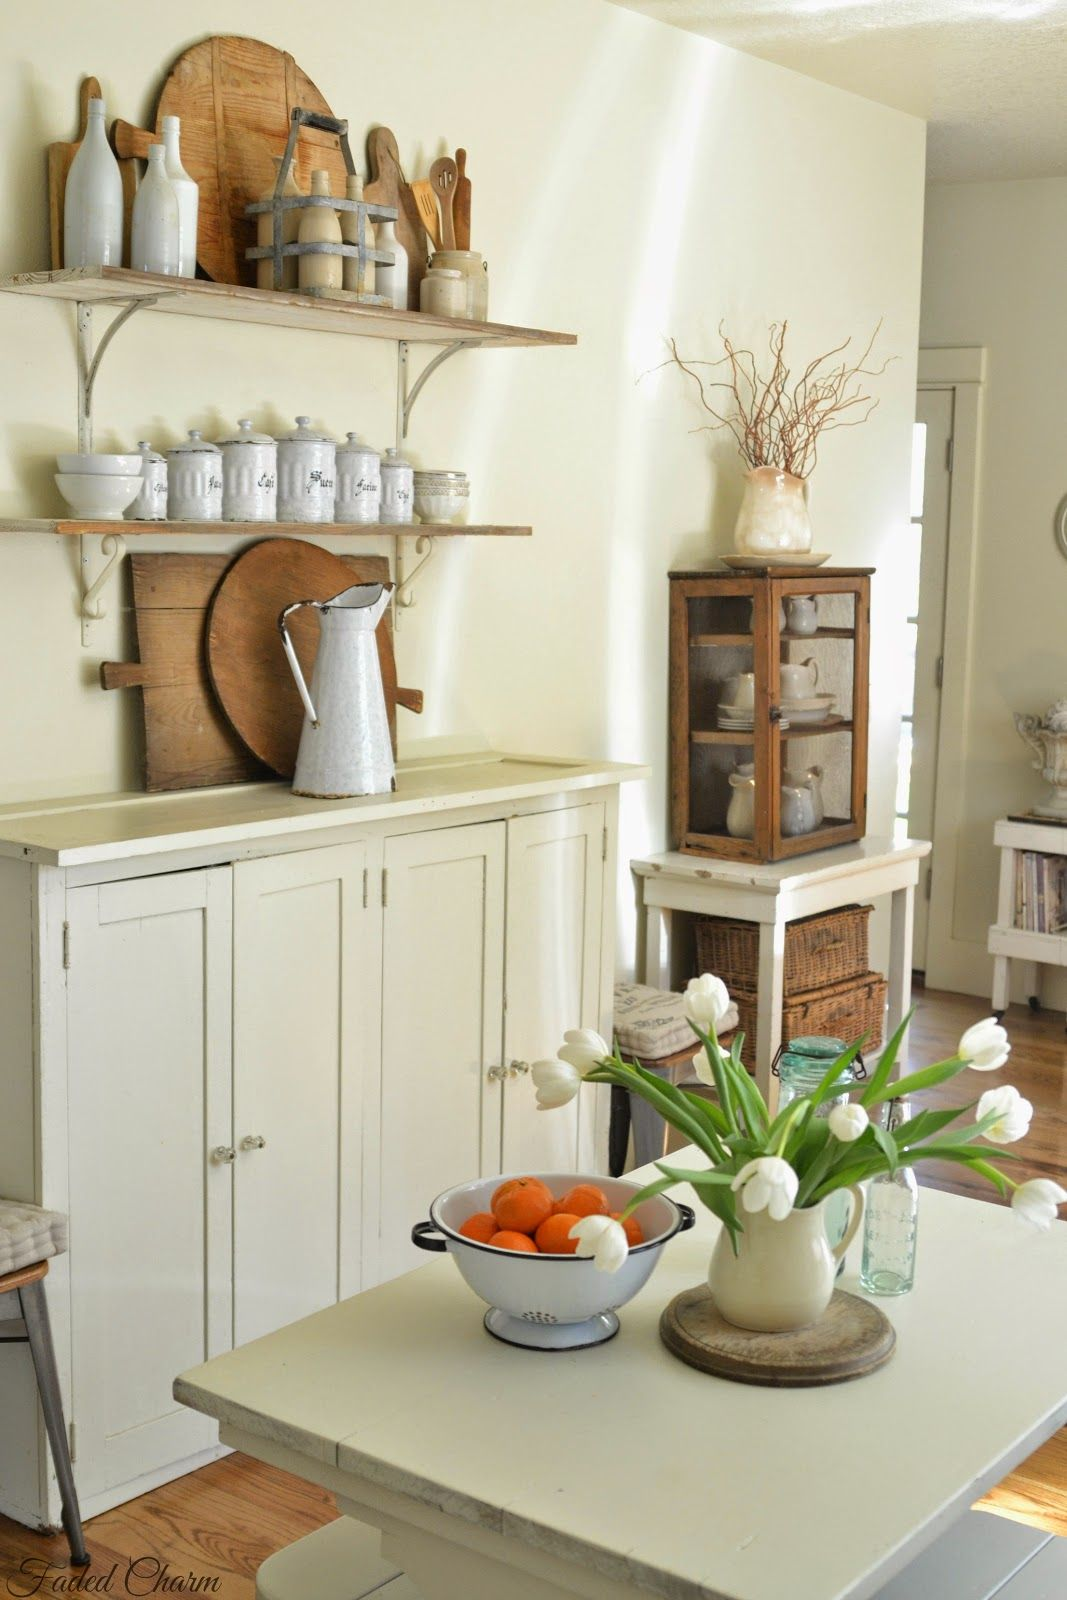 Faded Charm DiY Farmhouse Style Decorating Ideas ! | Home Decorating ...